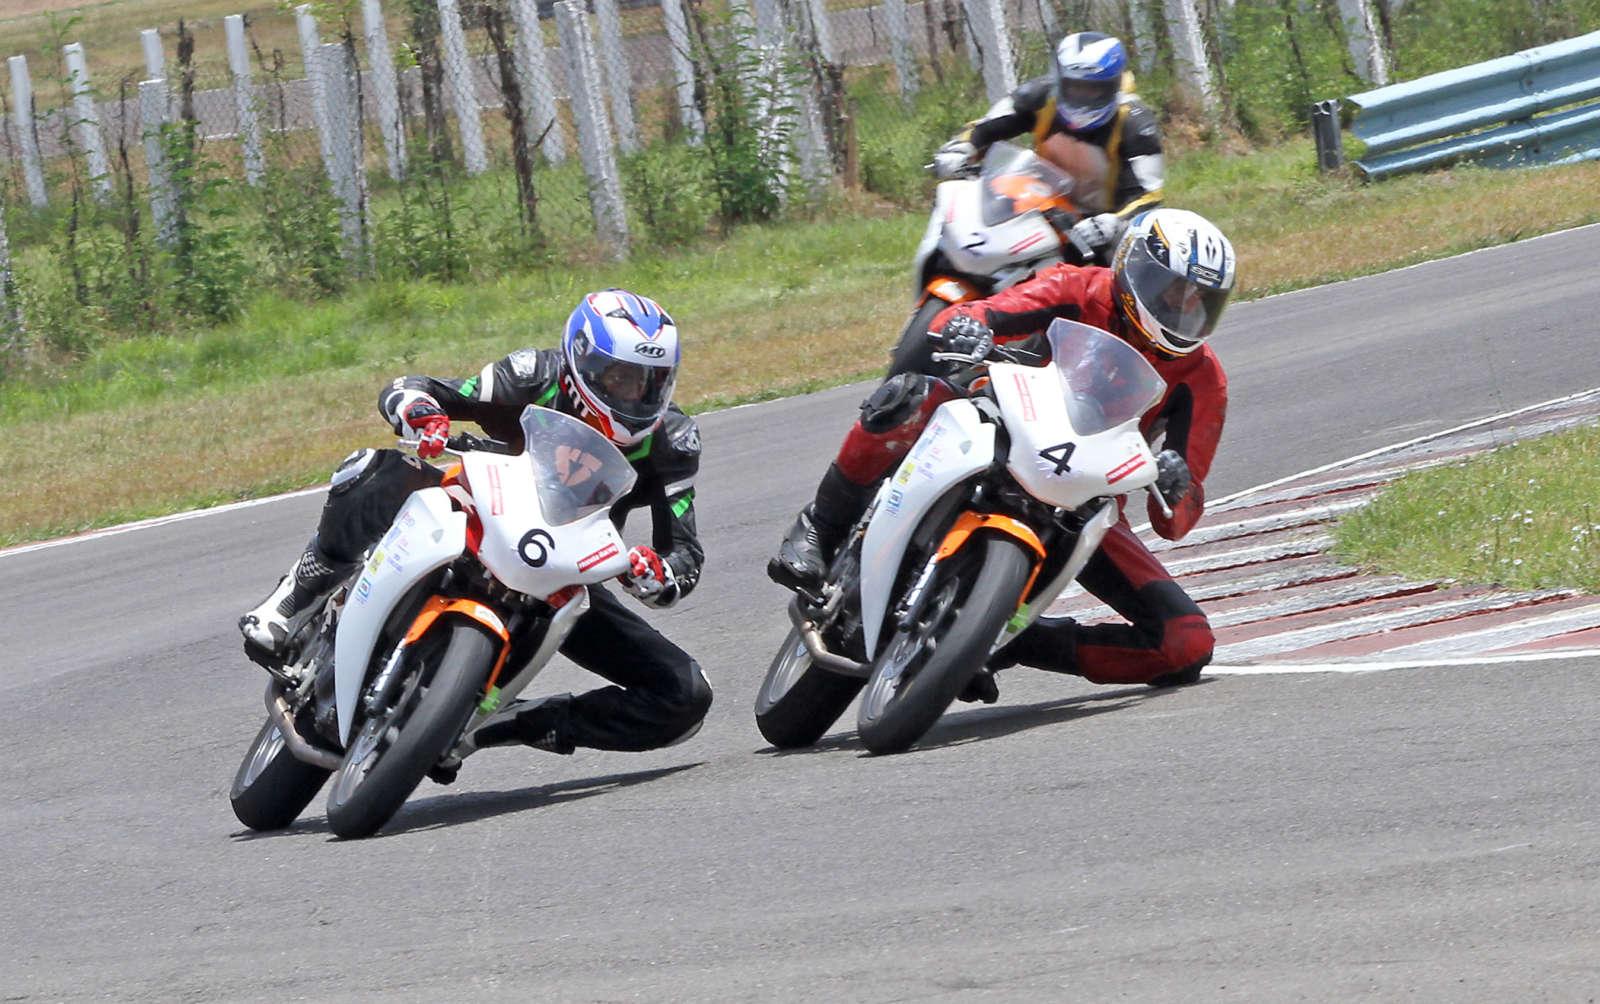 honda-one-make-race-2015-1 (2)